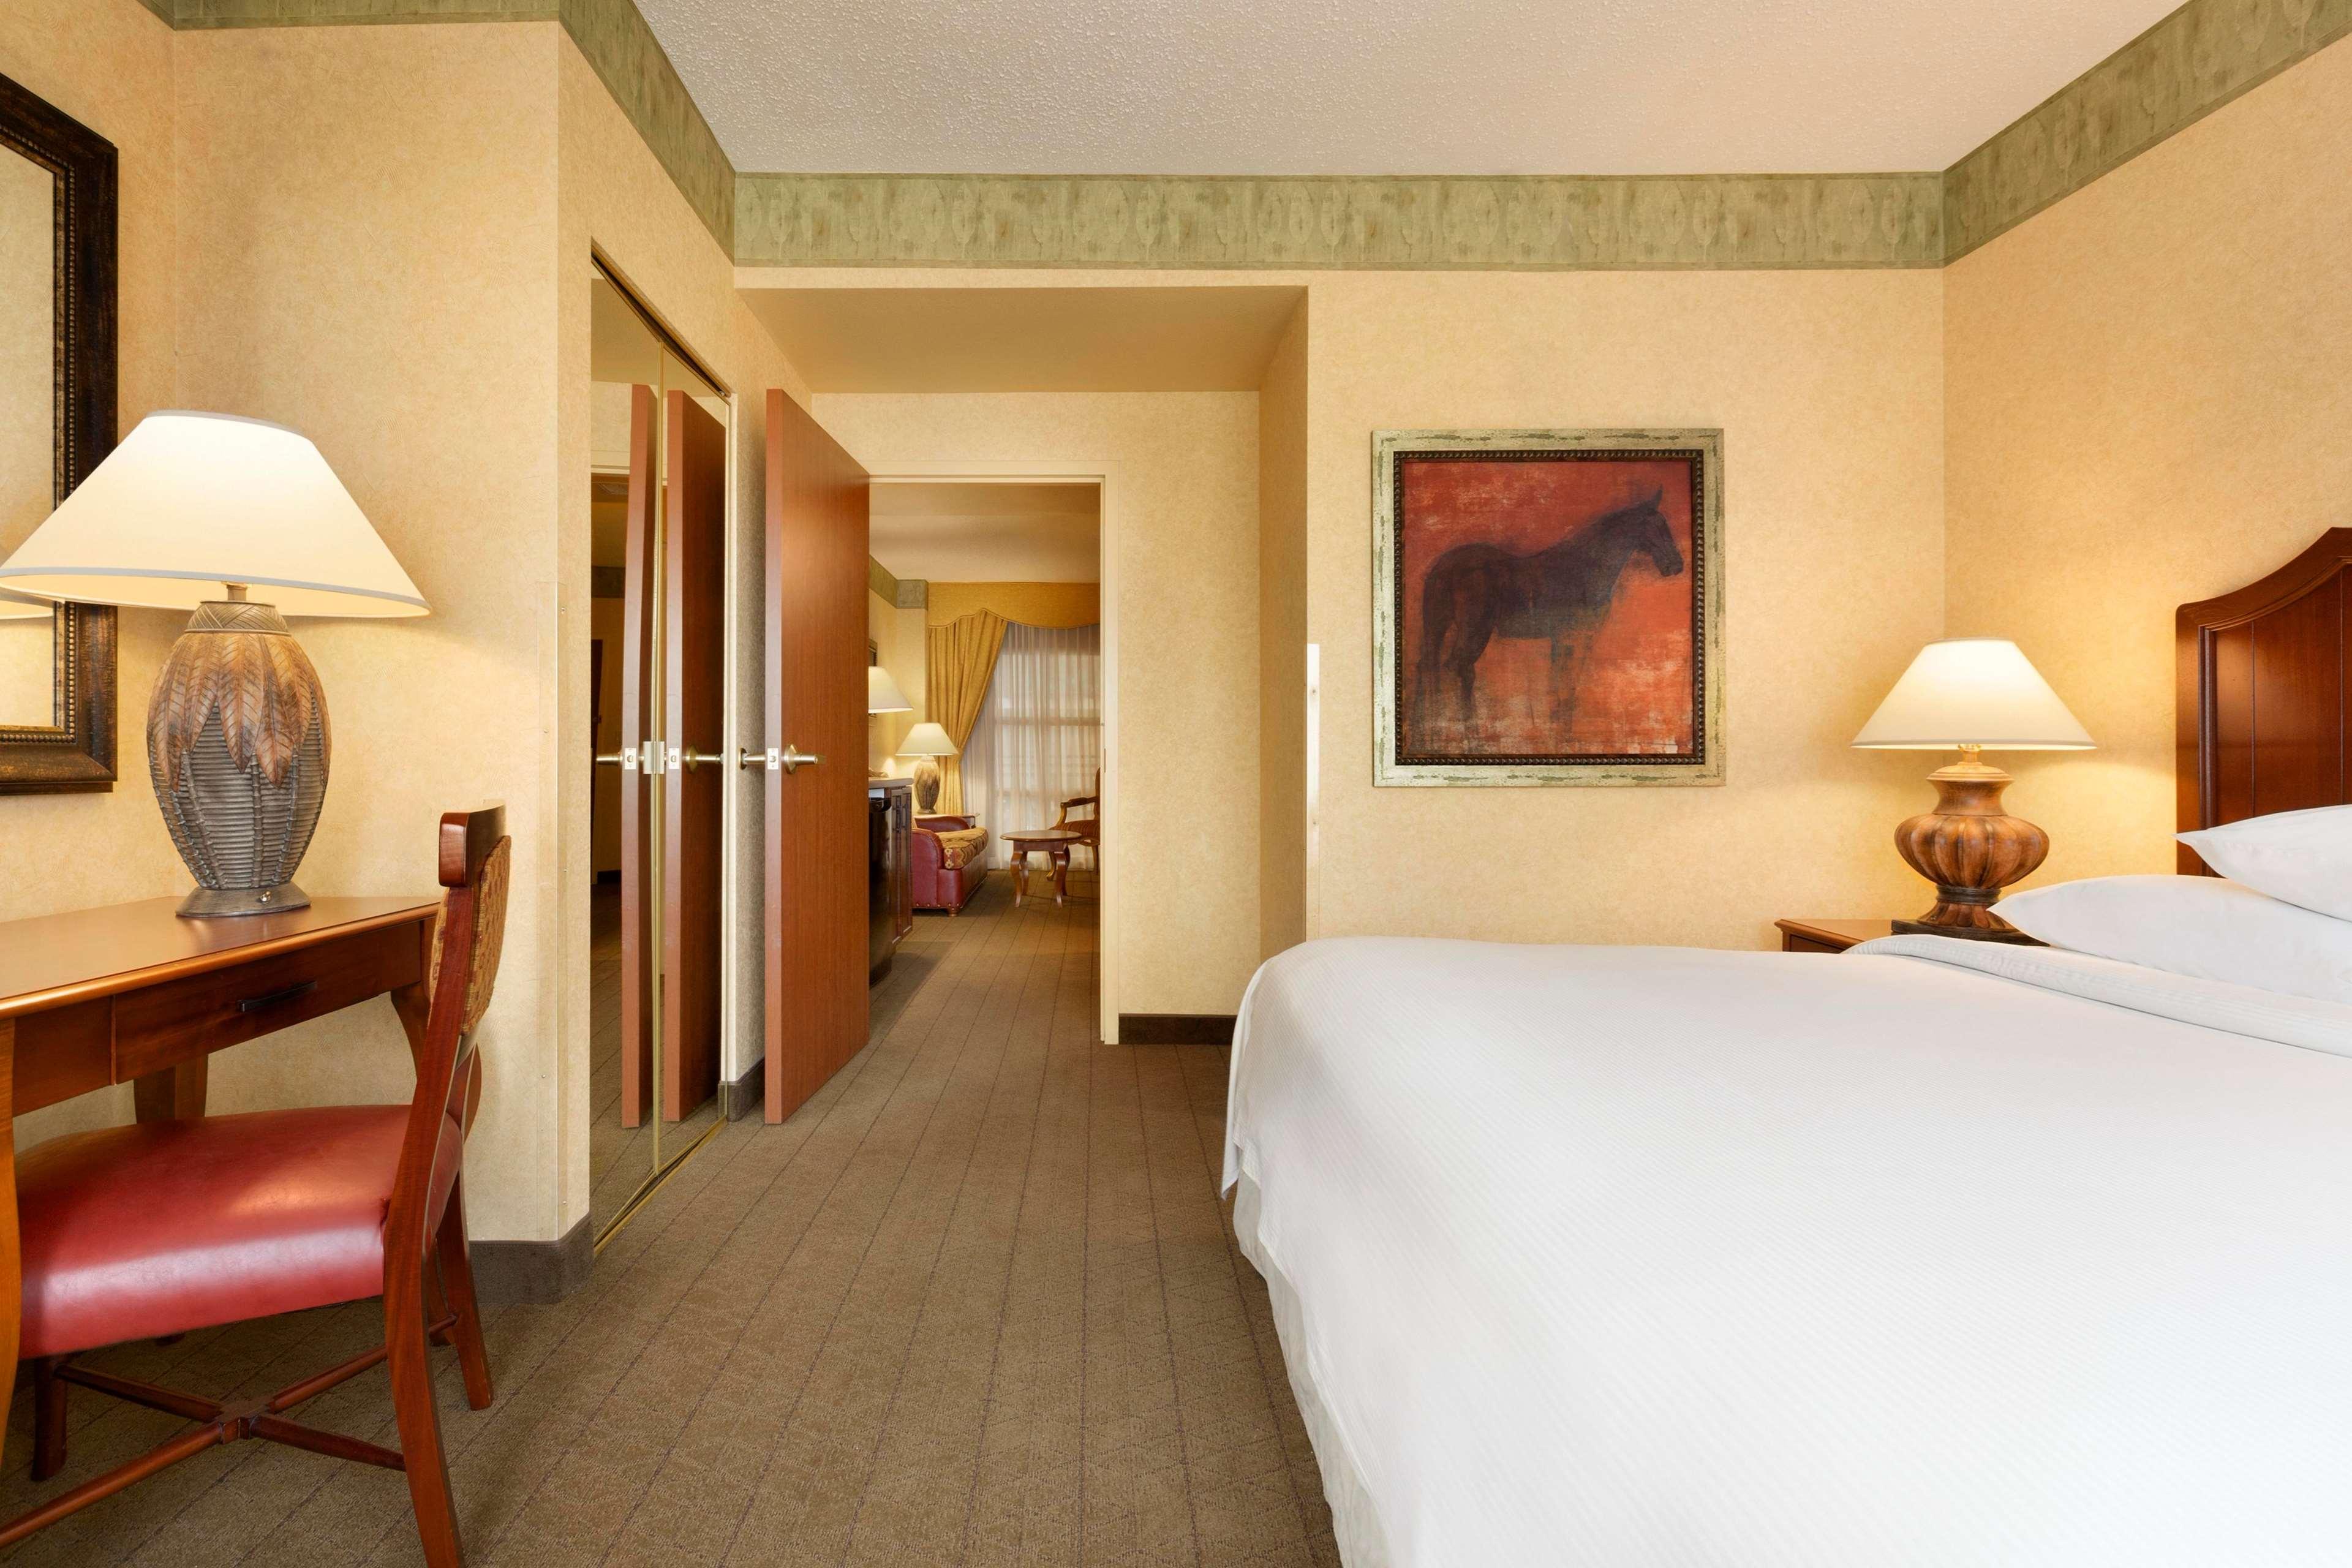 Embassy Suites by Hilton Albuquerque Hotel & Spa image 28